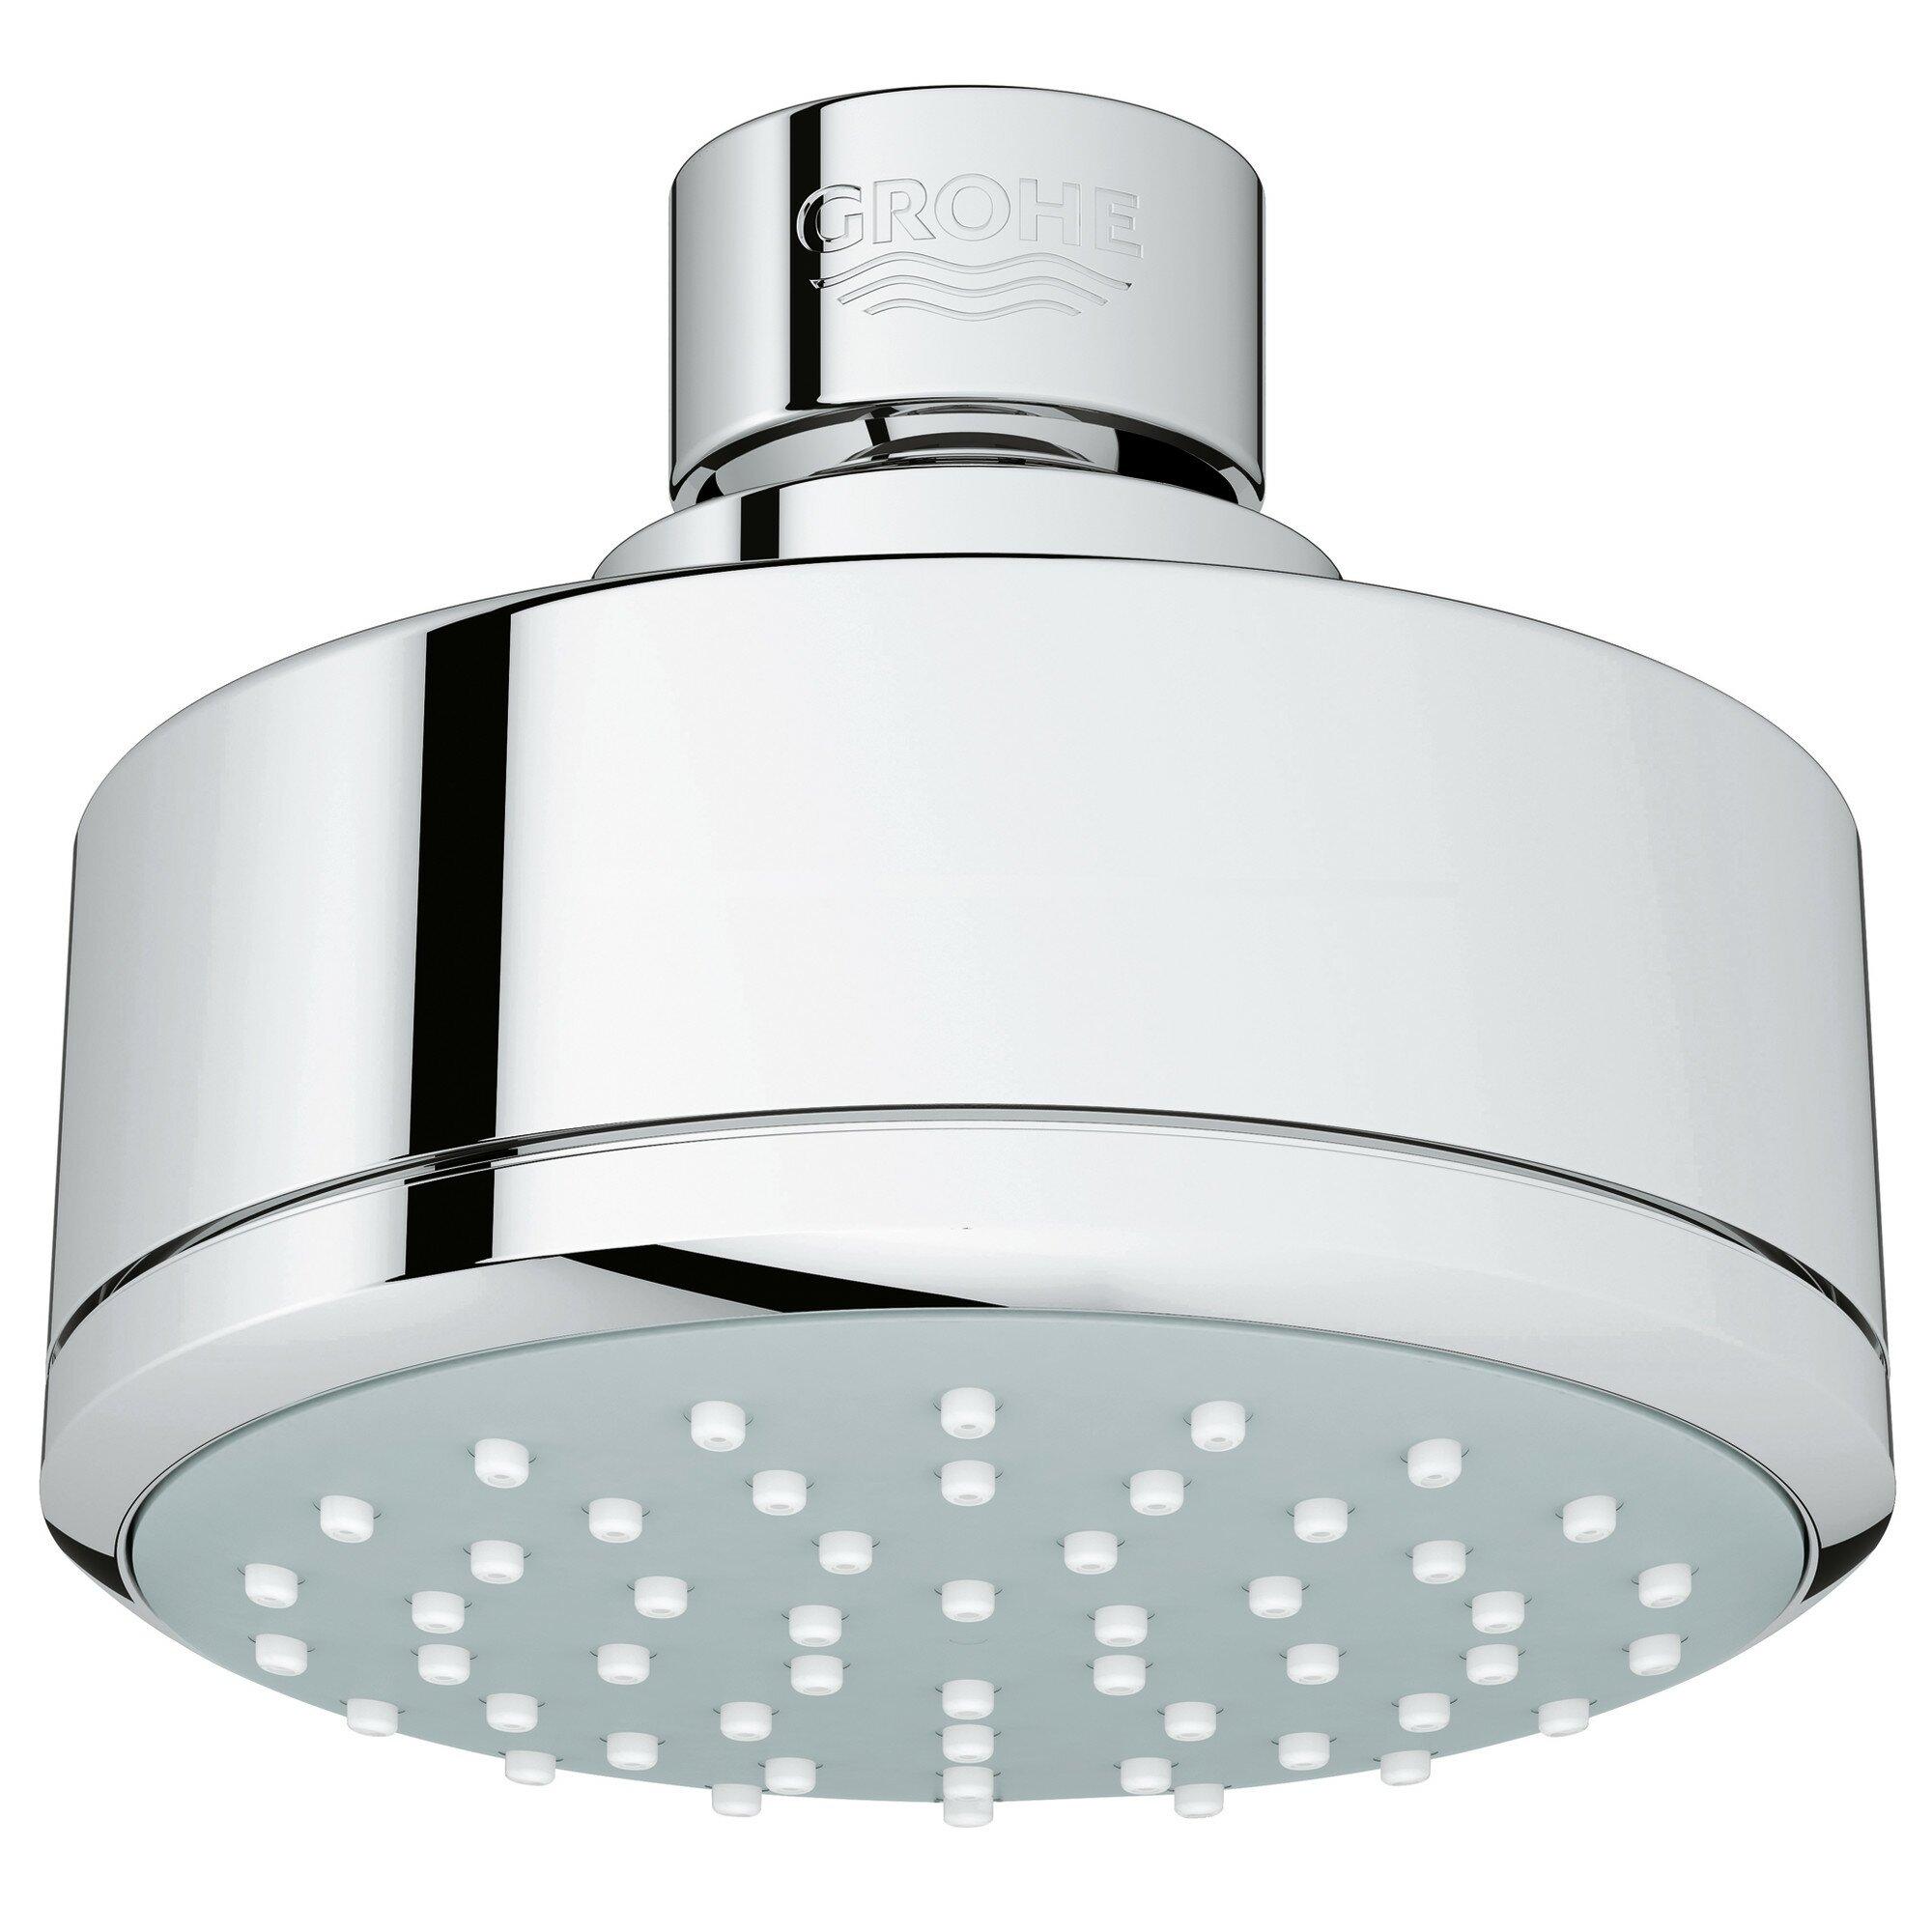 grohe new tempesta cosmopolitan shower head. Black Bedroom Furniture Sets. Home Design Ideas